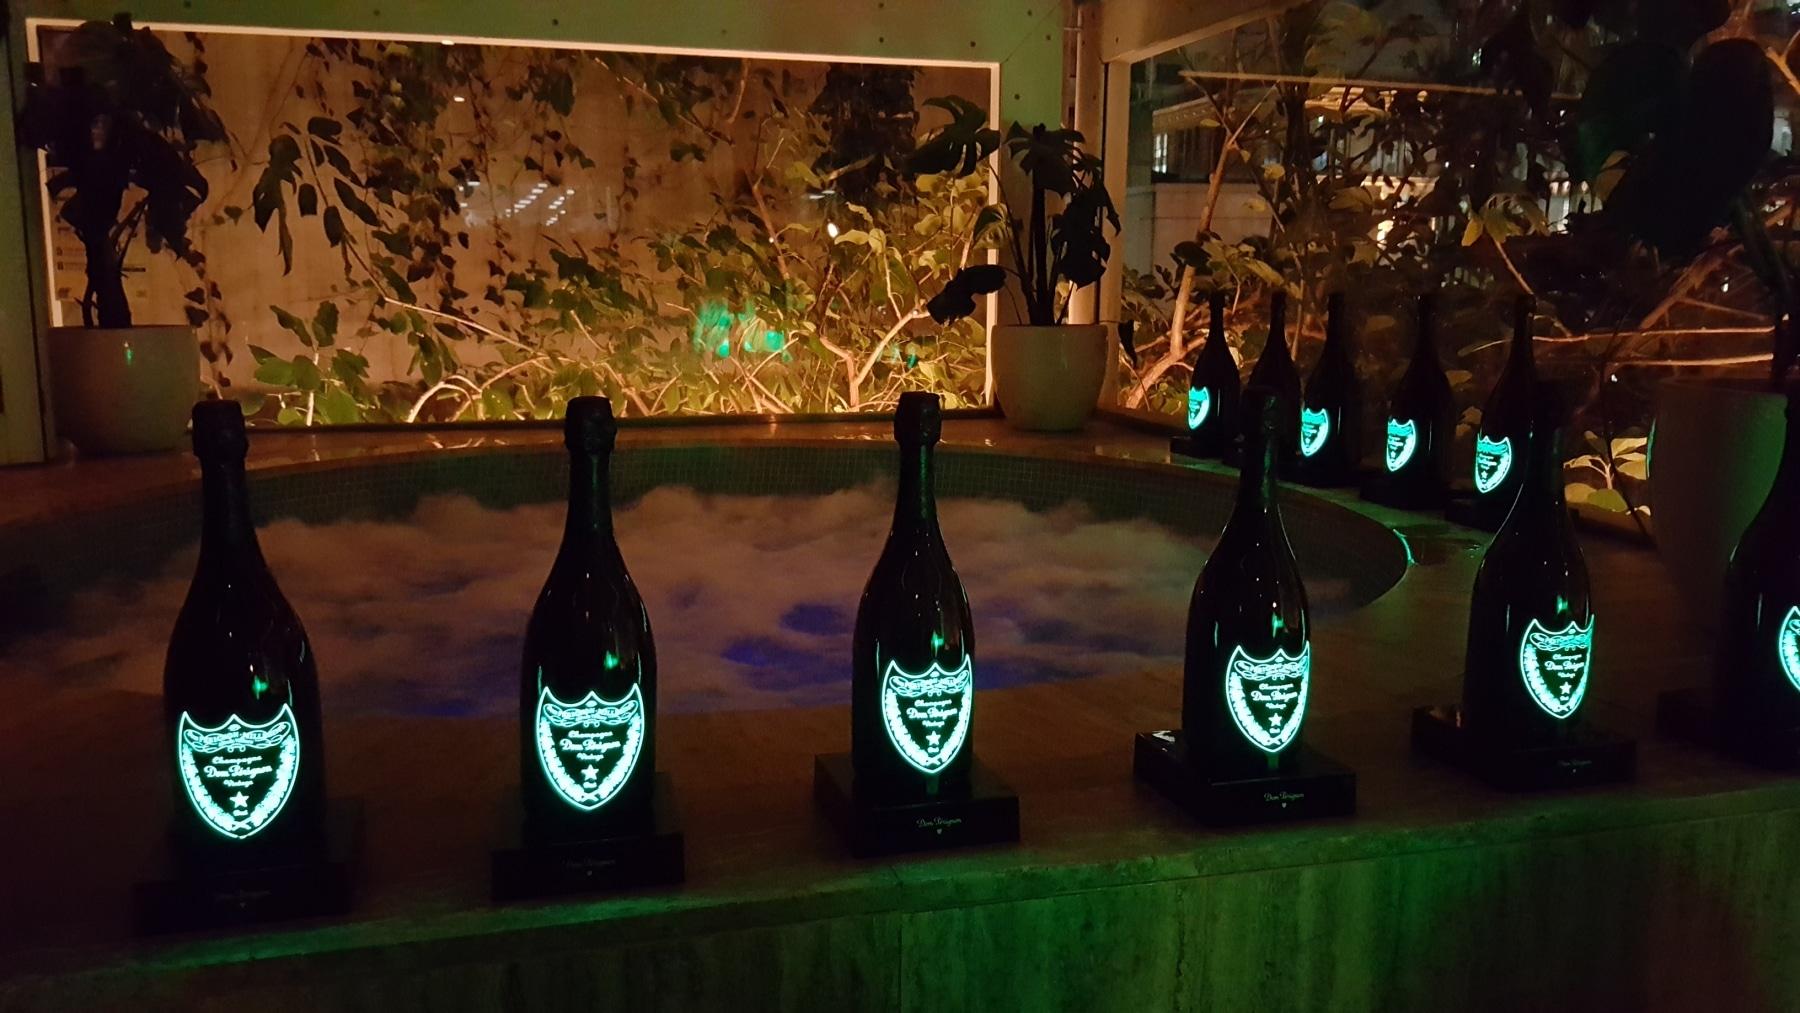 dom perignon luminous glowing bottle night